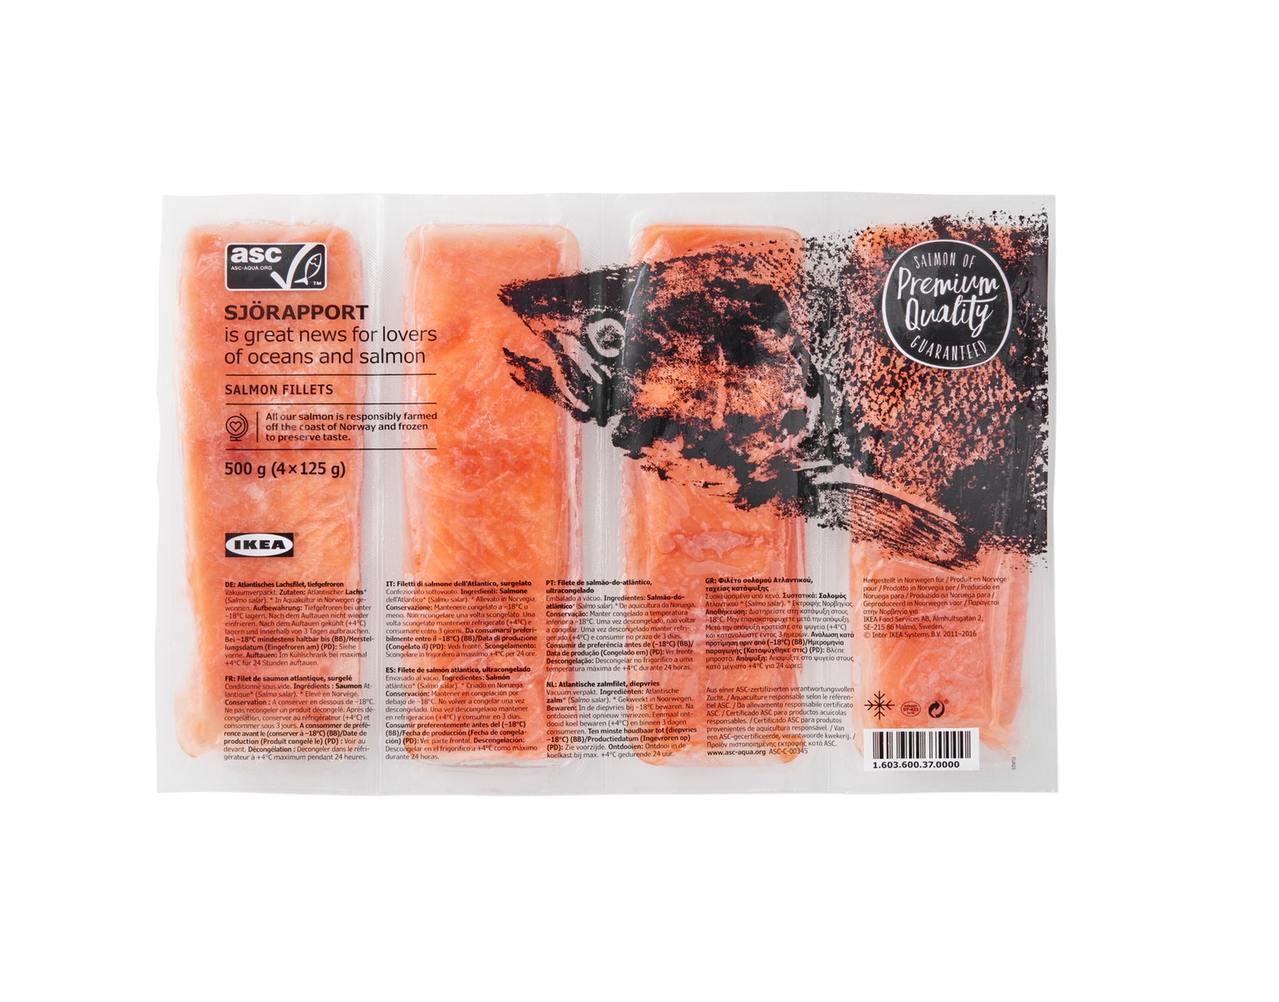 IKEA SJÖRAPPORT鮭魚菲力,售價550元。圖/IKEA提供